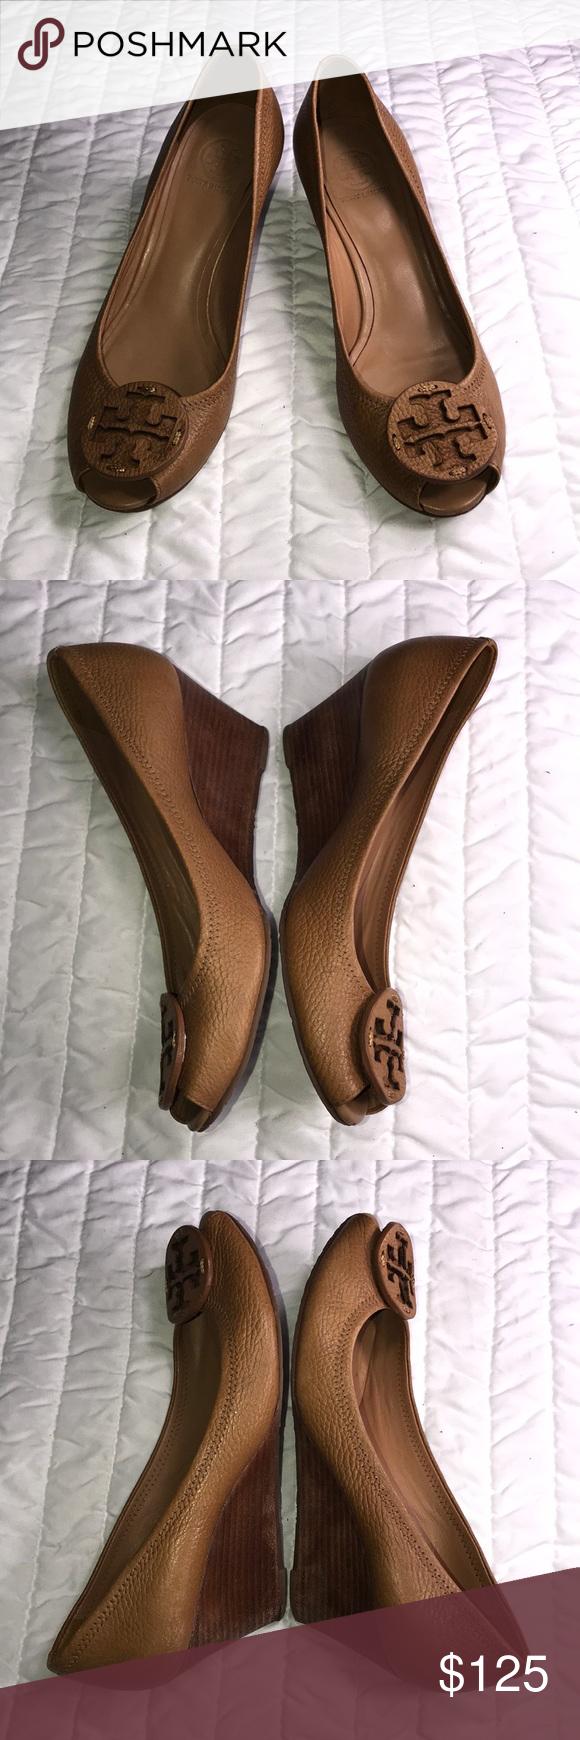 5e22a19d7 Tory Burch Sally 2 tumbled leather wedge sz 8.5 US Tory Burch Sally 2 royal  tan